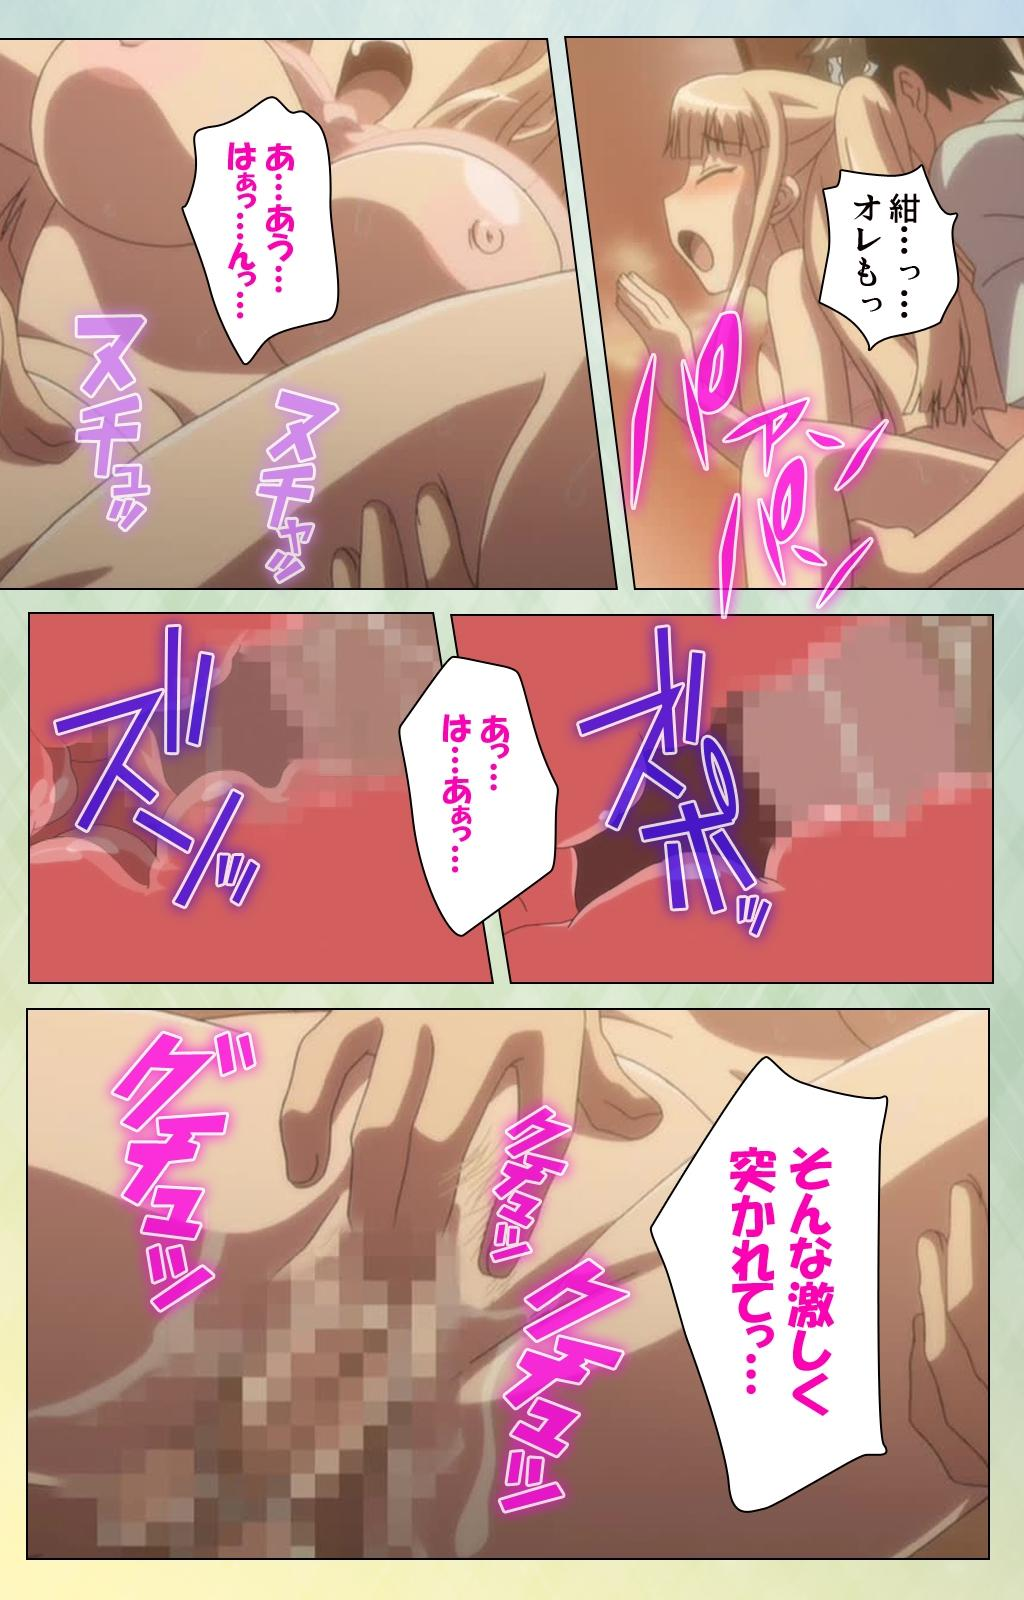 Furueru Kuchibiru fuzzy lips1 Complete Ban 87